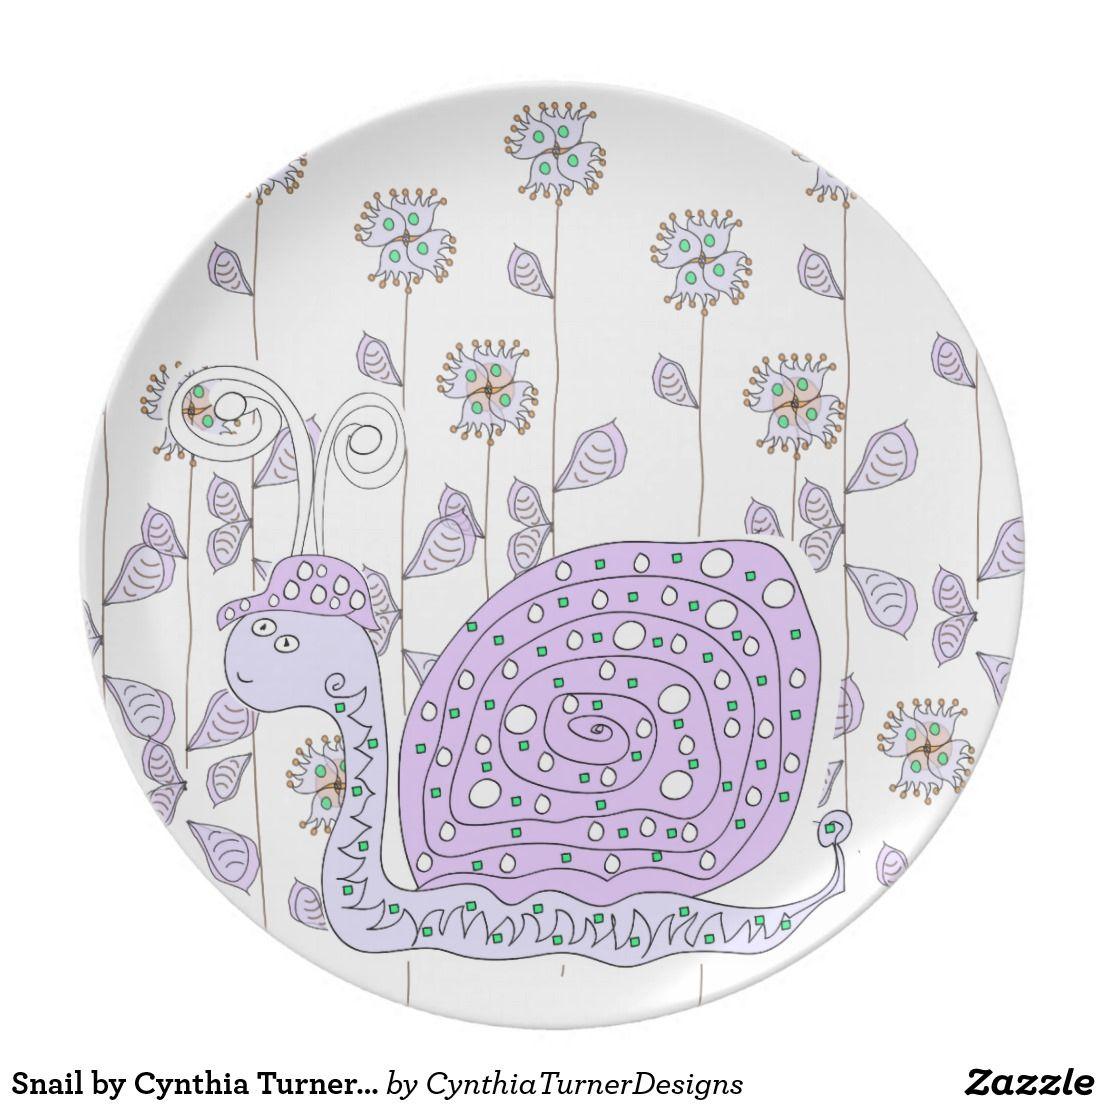 sc 1 st  Pinterest & Snail by Cynthia Turner Designs Plate